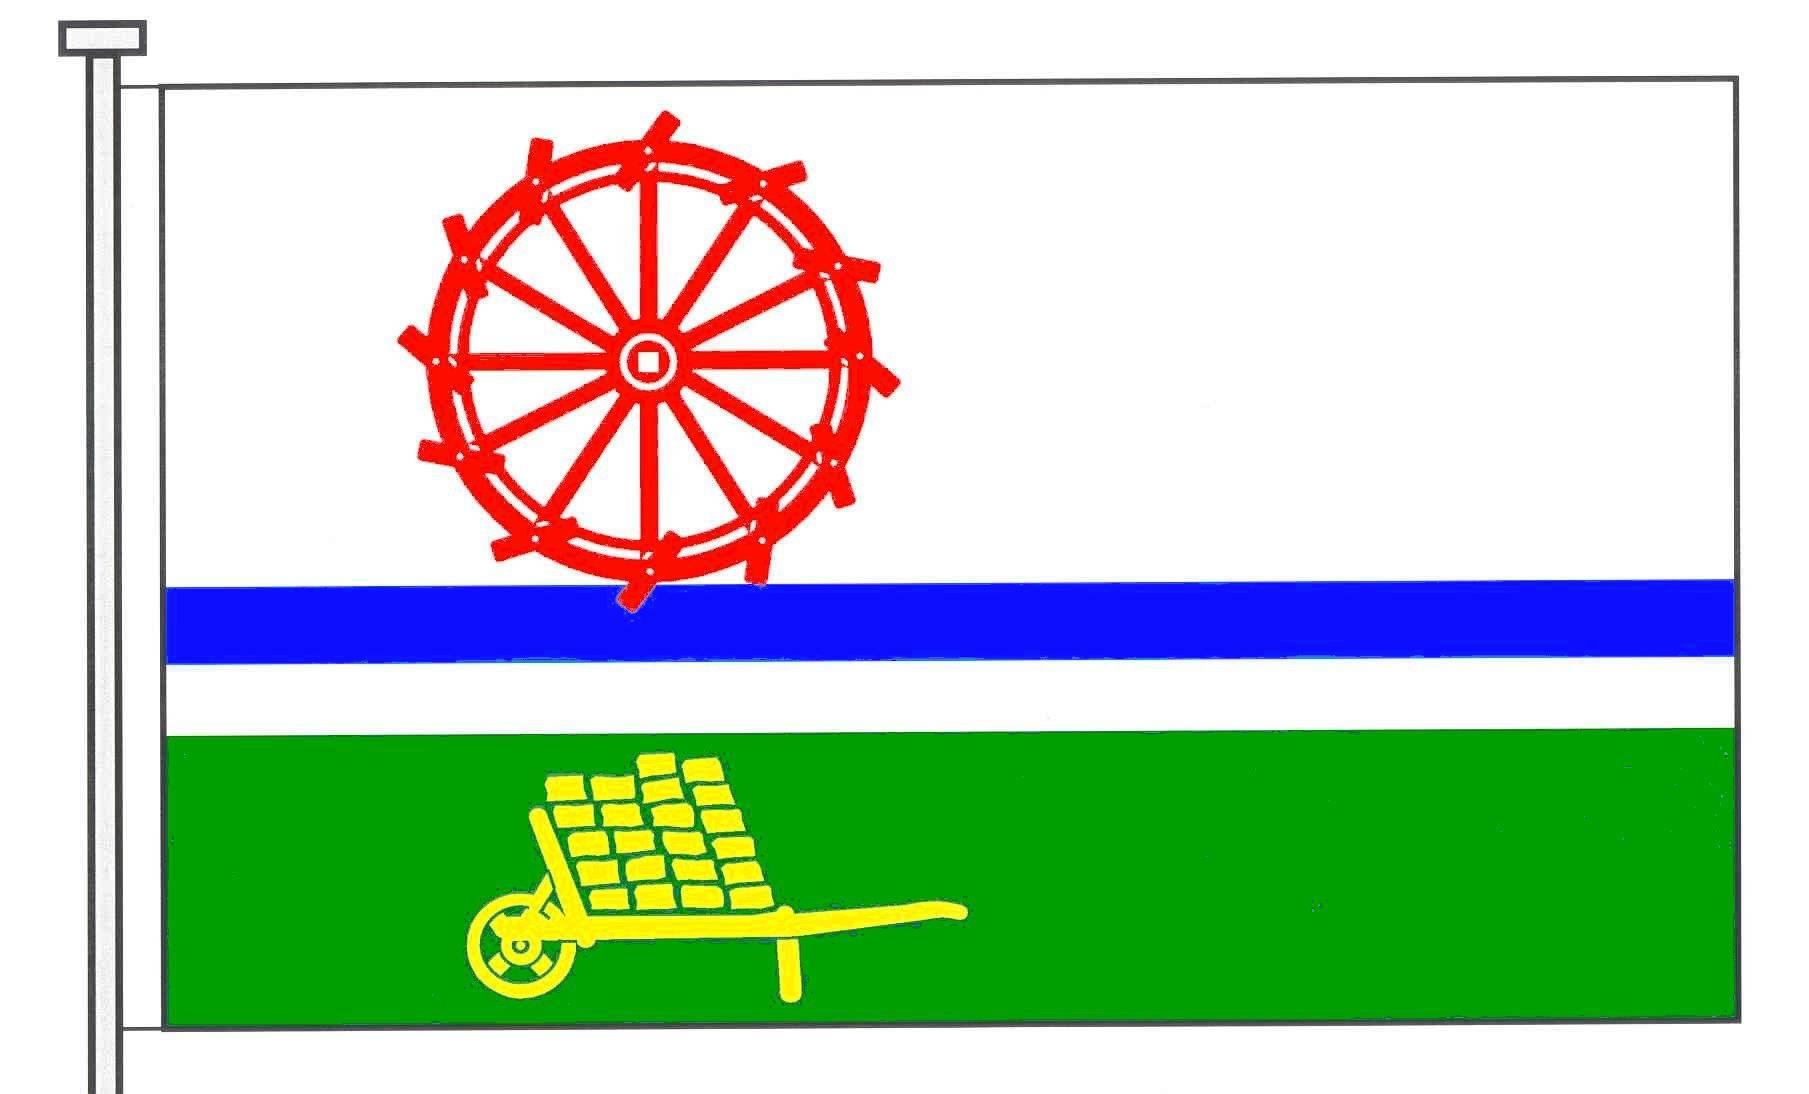 Flagge GemeindeBimöhlen, Kreis Segeberg